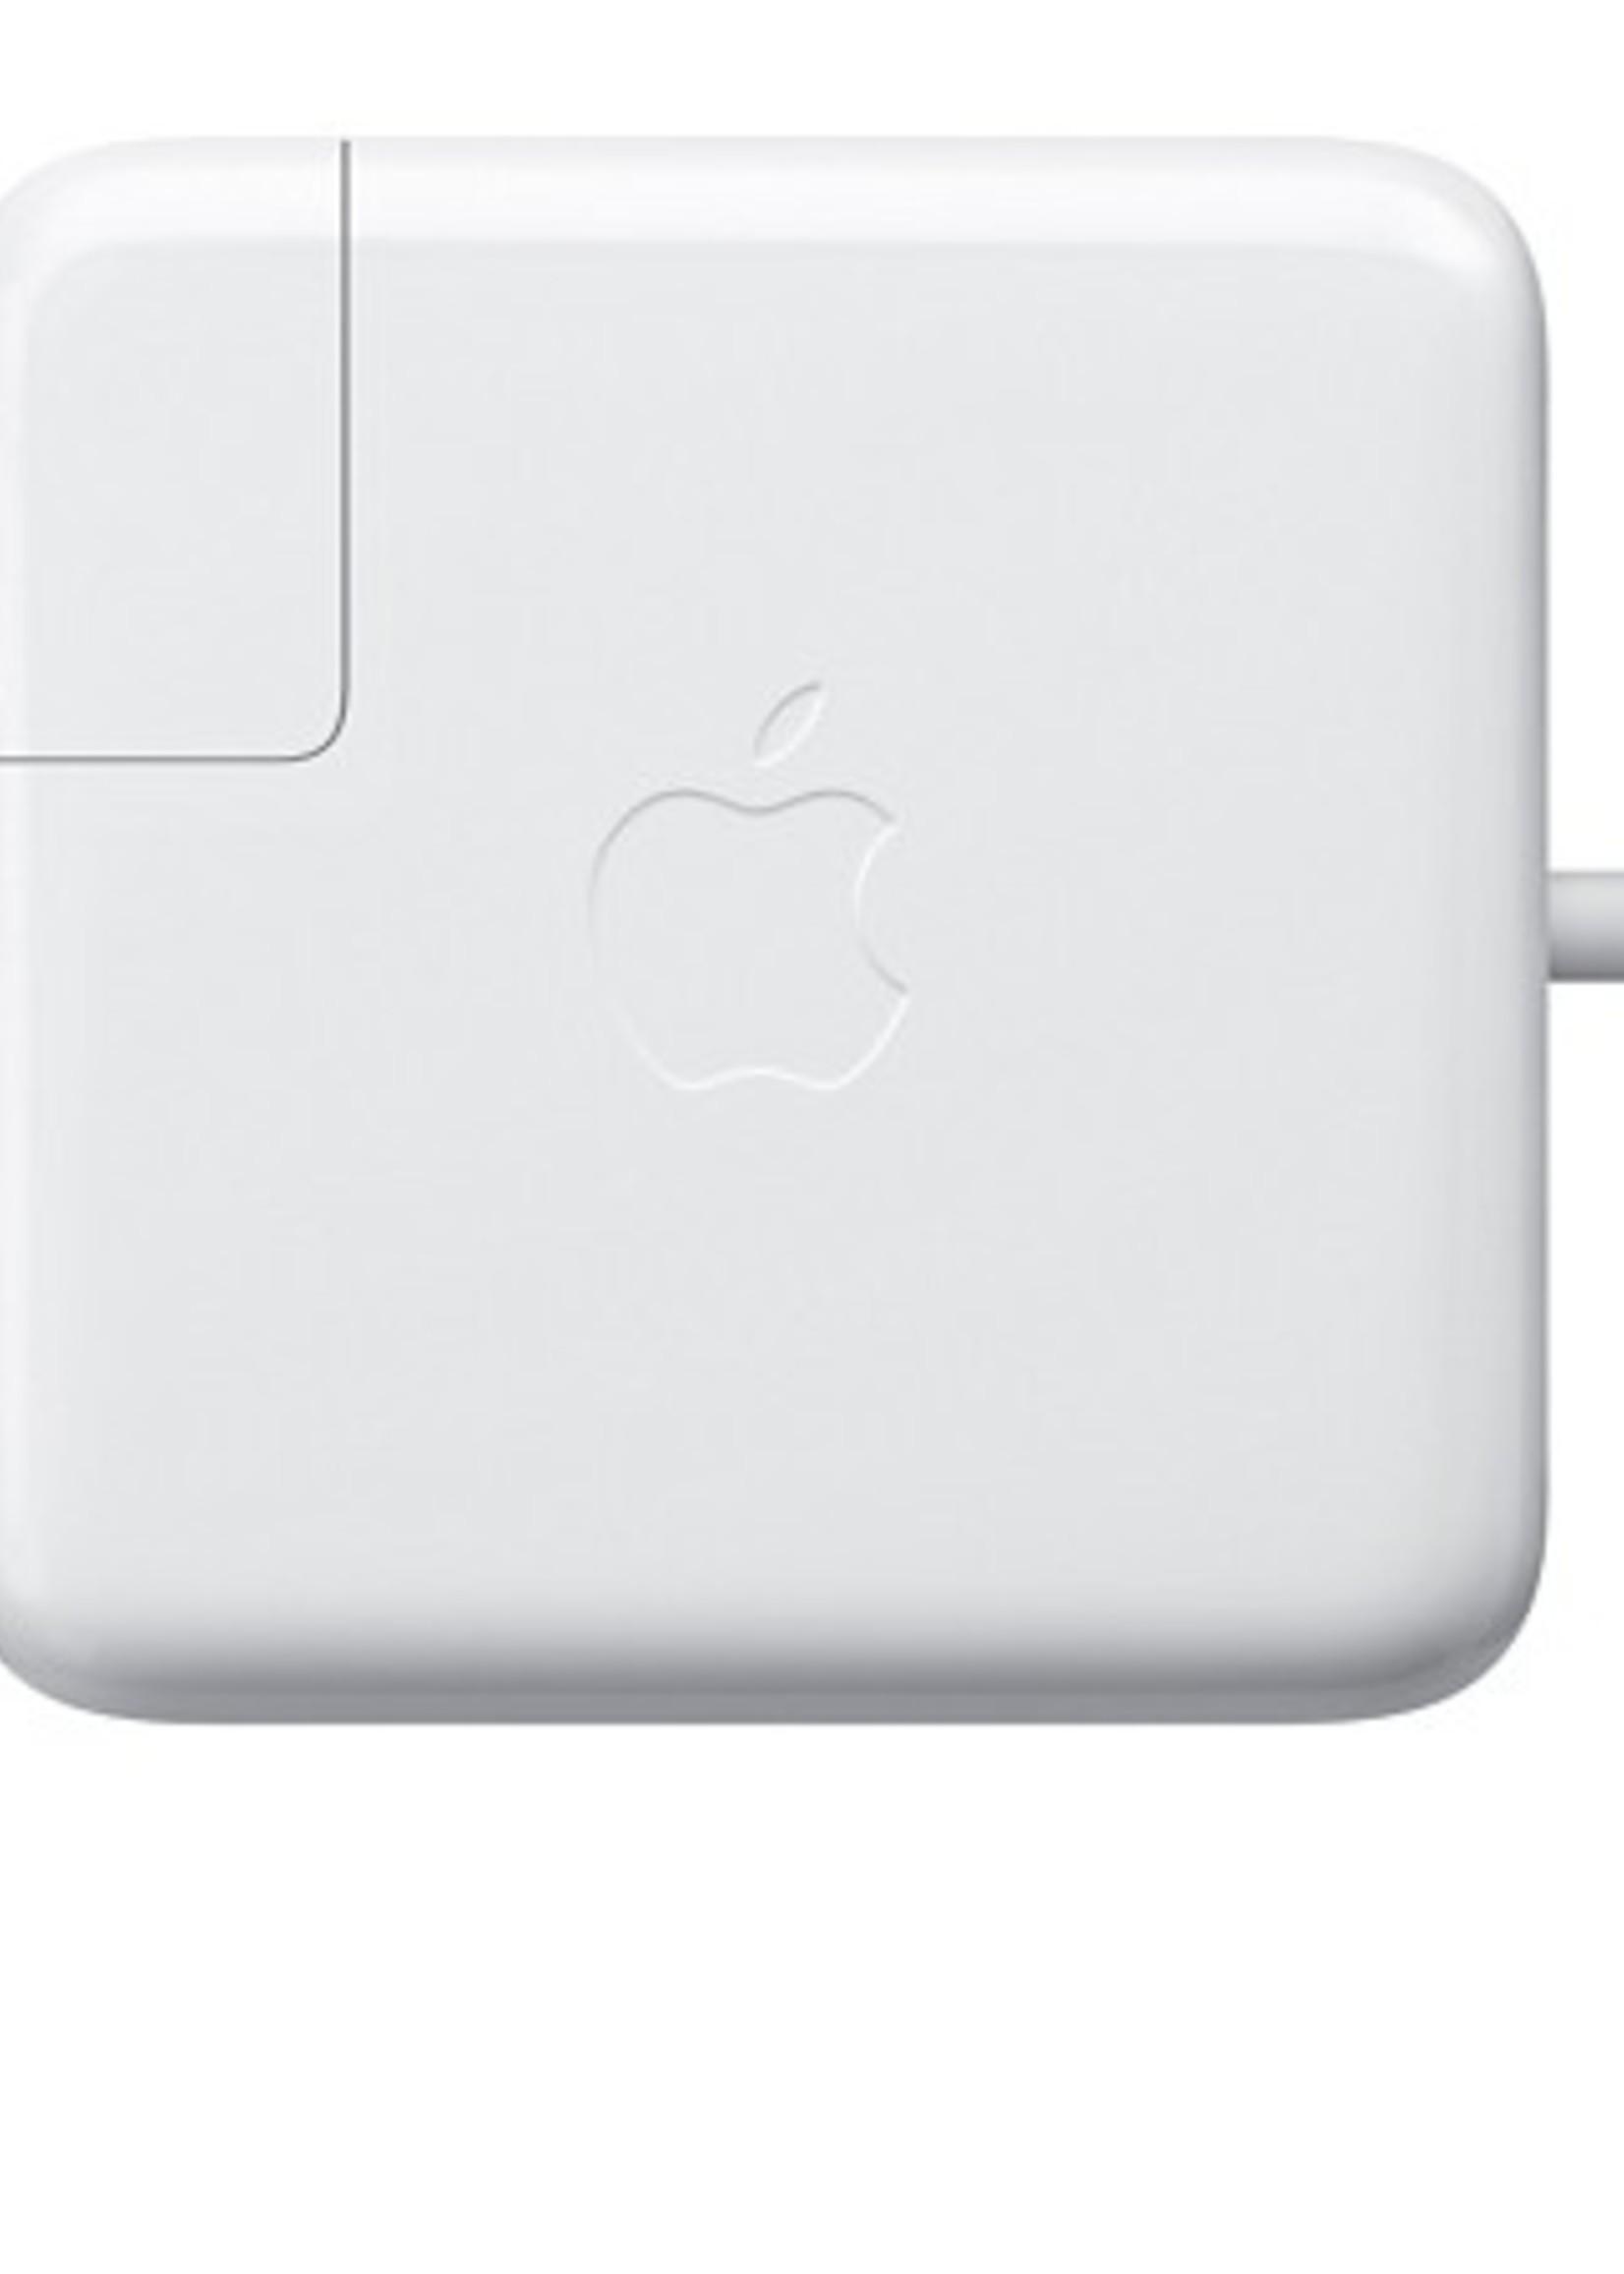 Apple 60W MagSafe Power Adapter (Older generation 13 & 13.3 inch MacBooks)